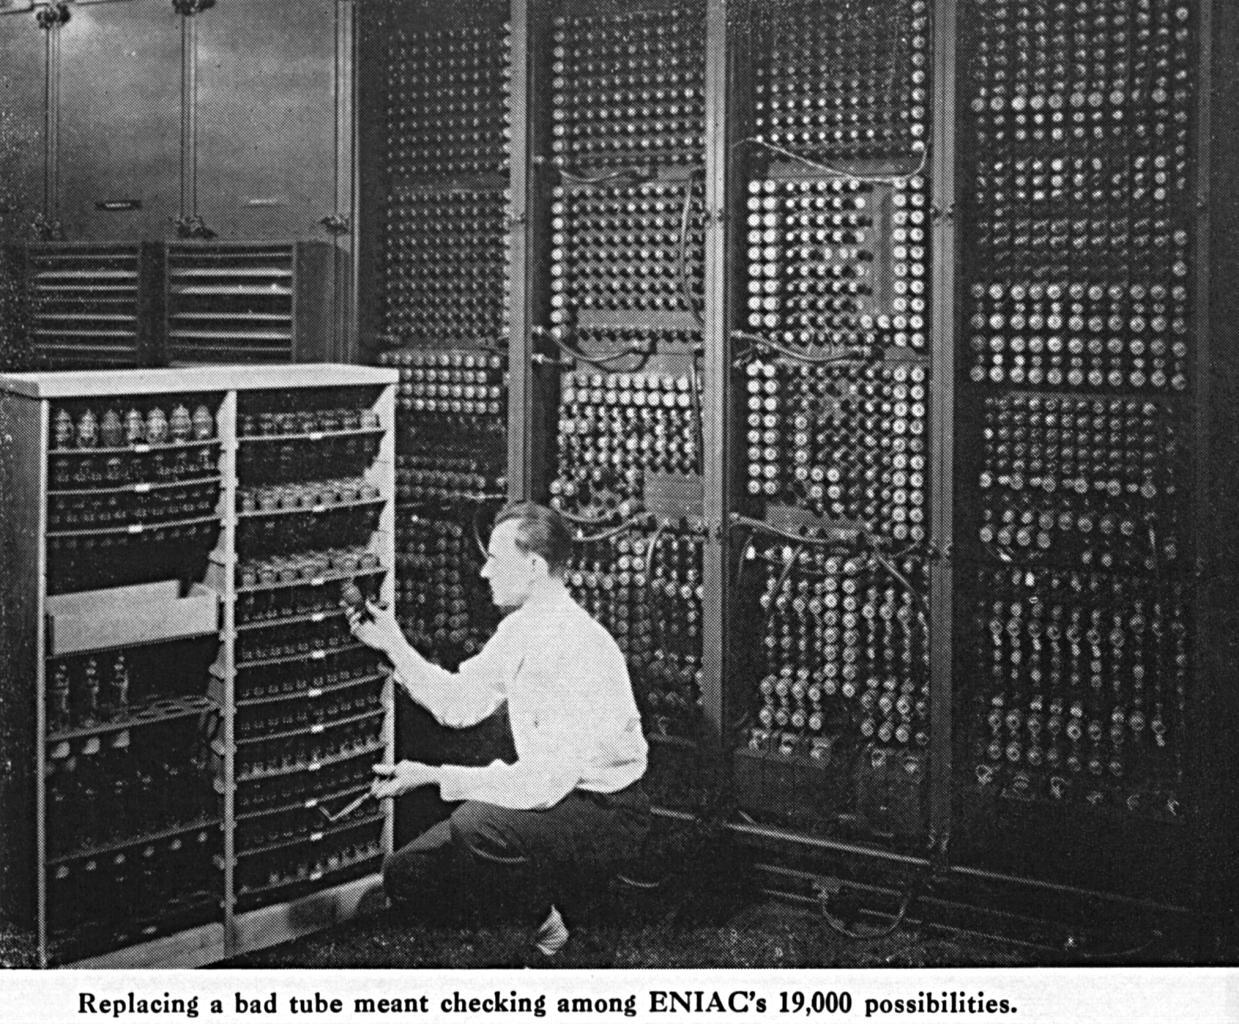 ENIAC-changing a tube.jpg